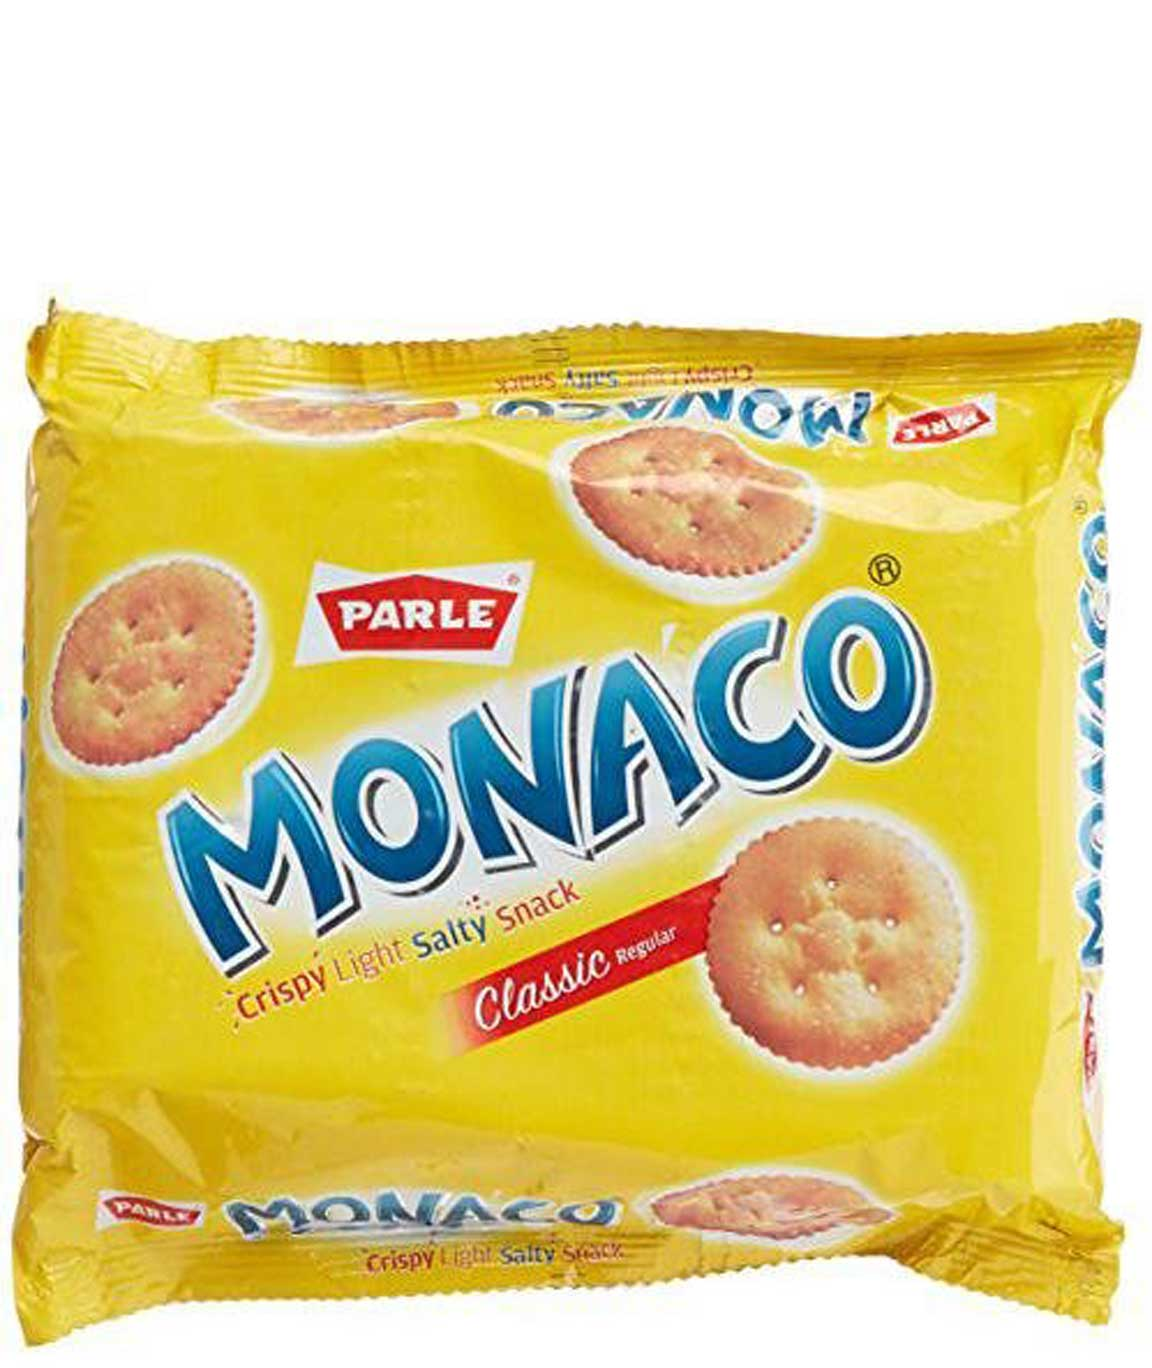 Parle Monaco Biscuit, 75.4g